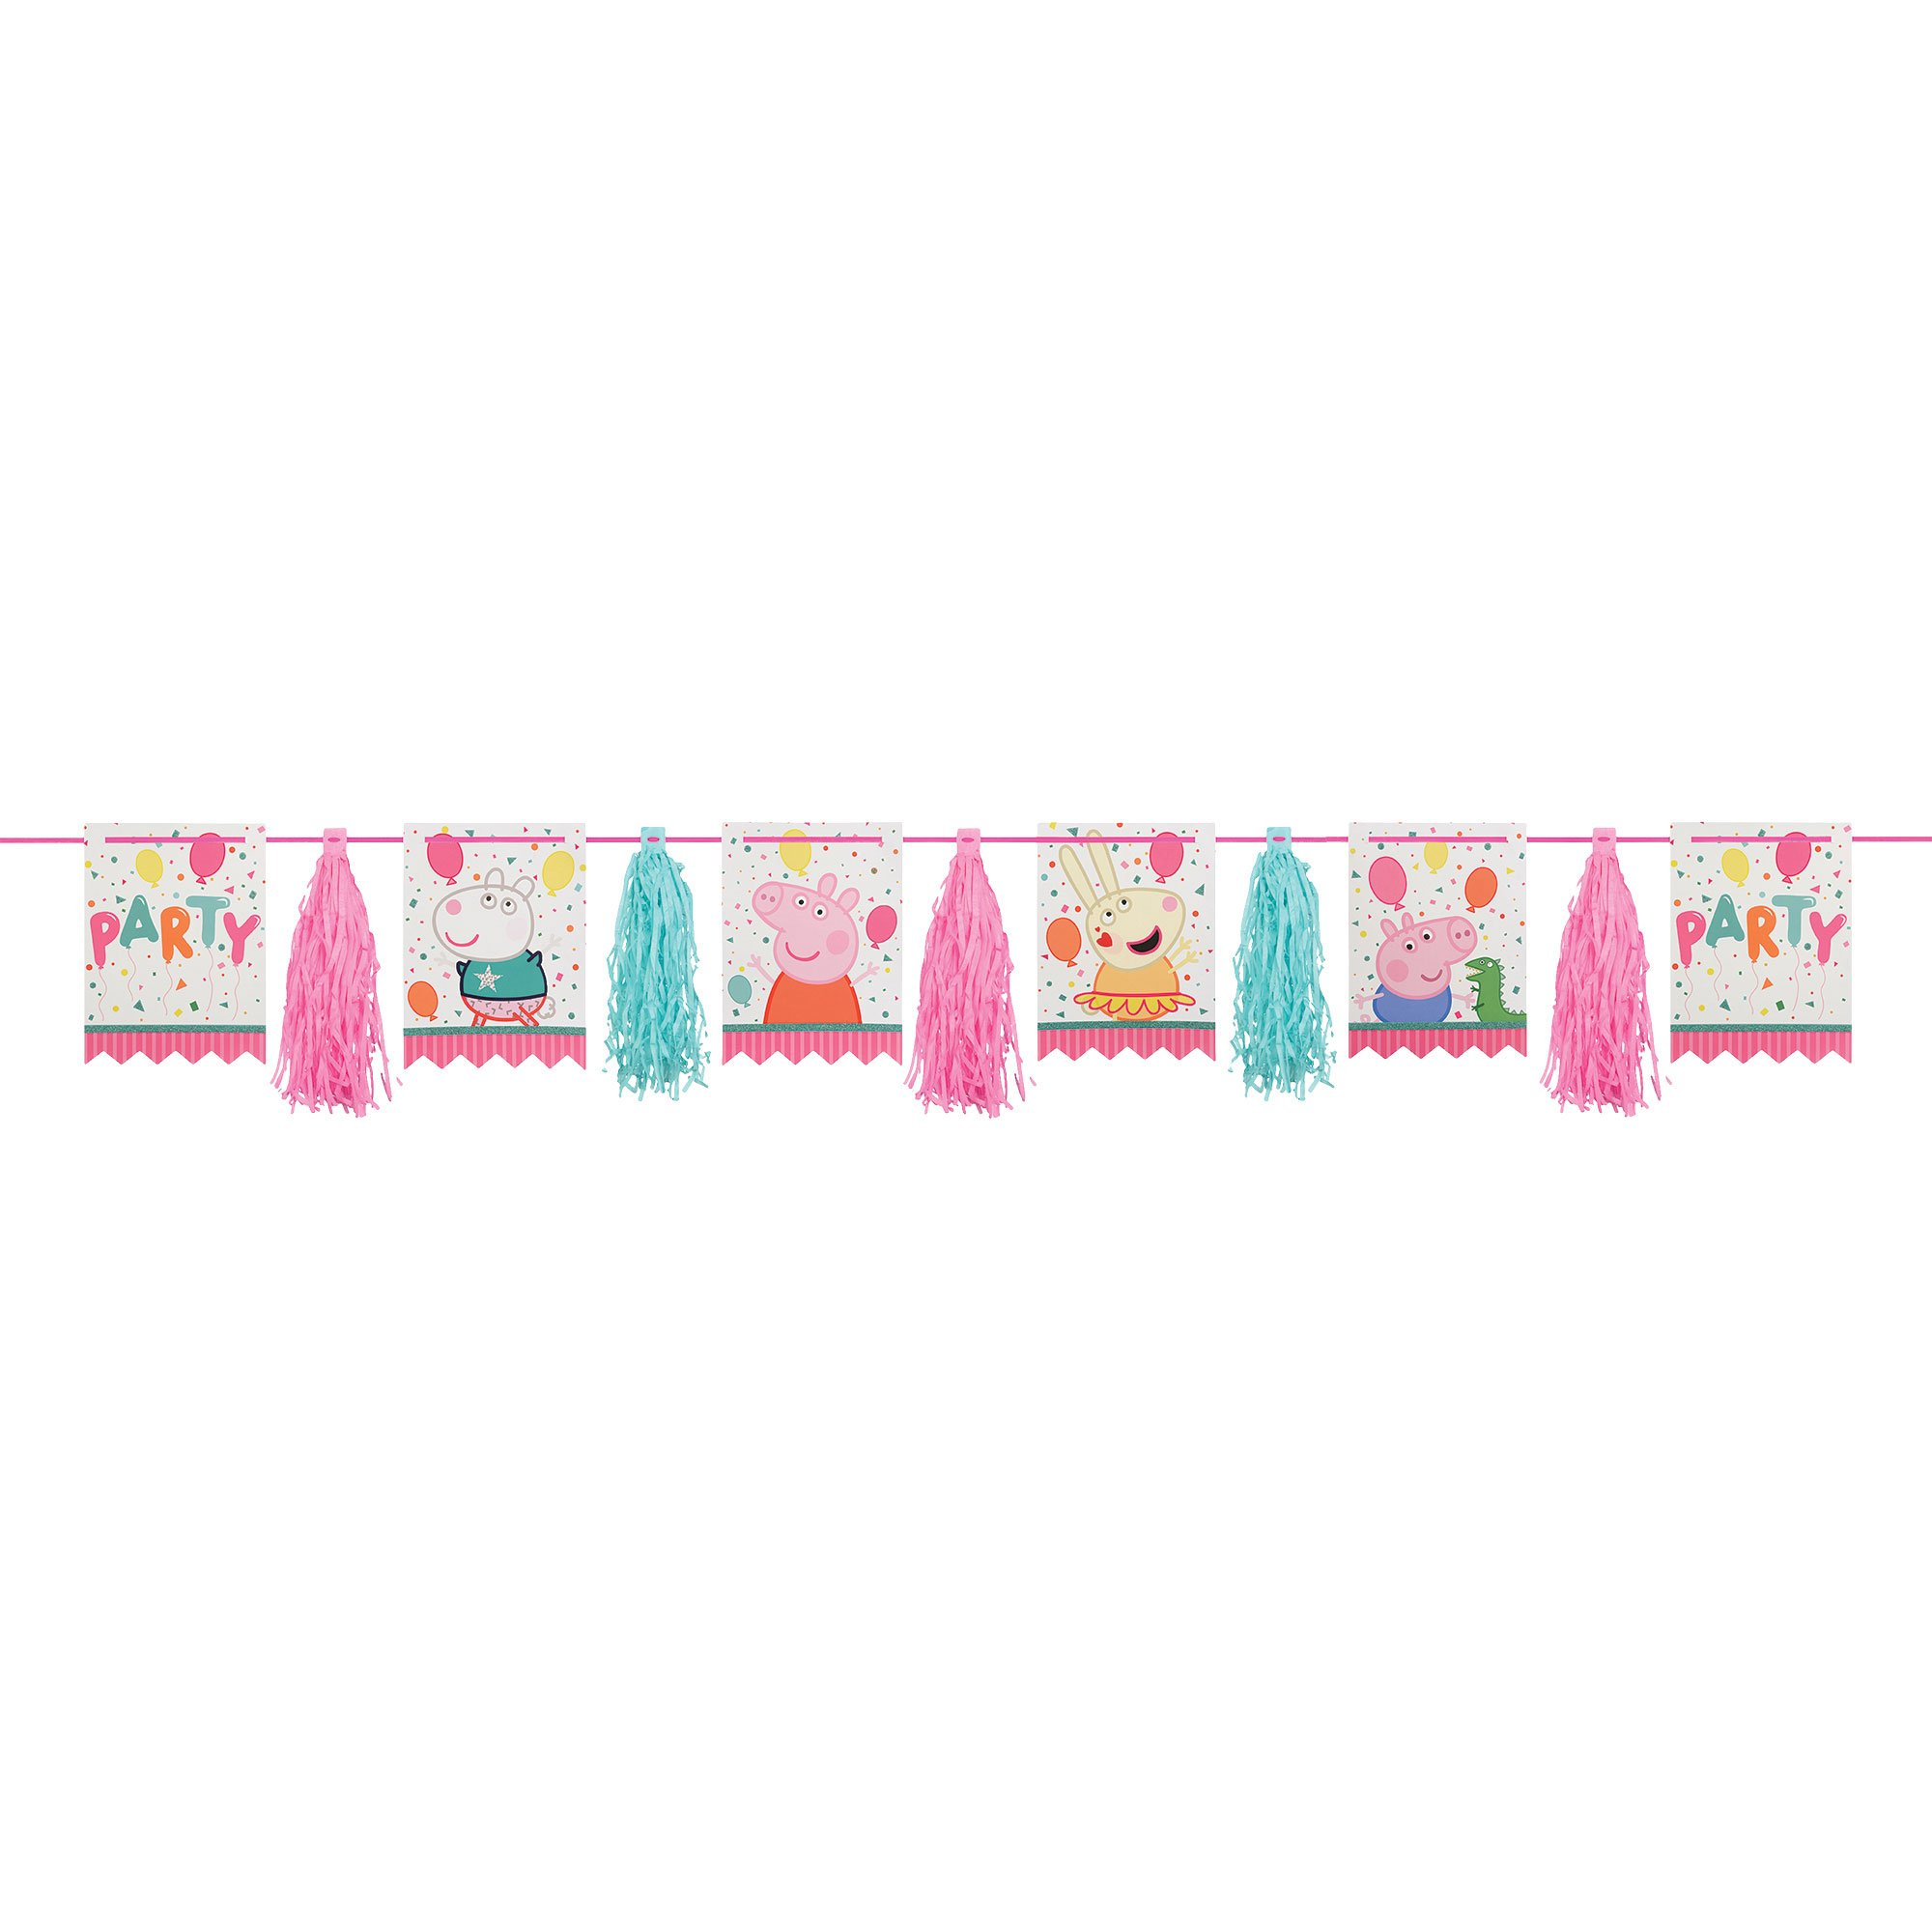 Peppa Pig Confetti Party Pennants & Tassel Garland Glittered